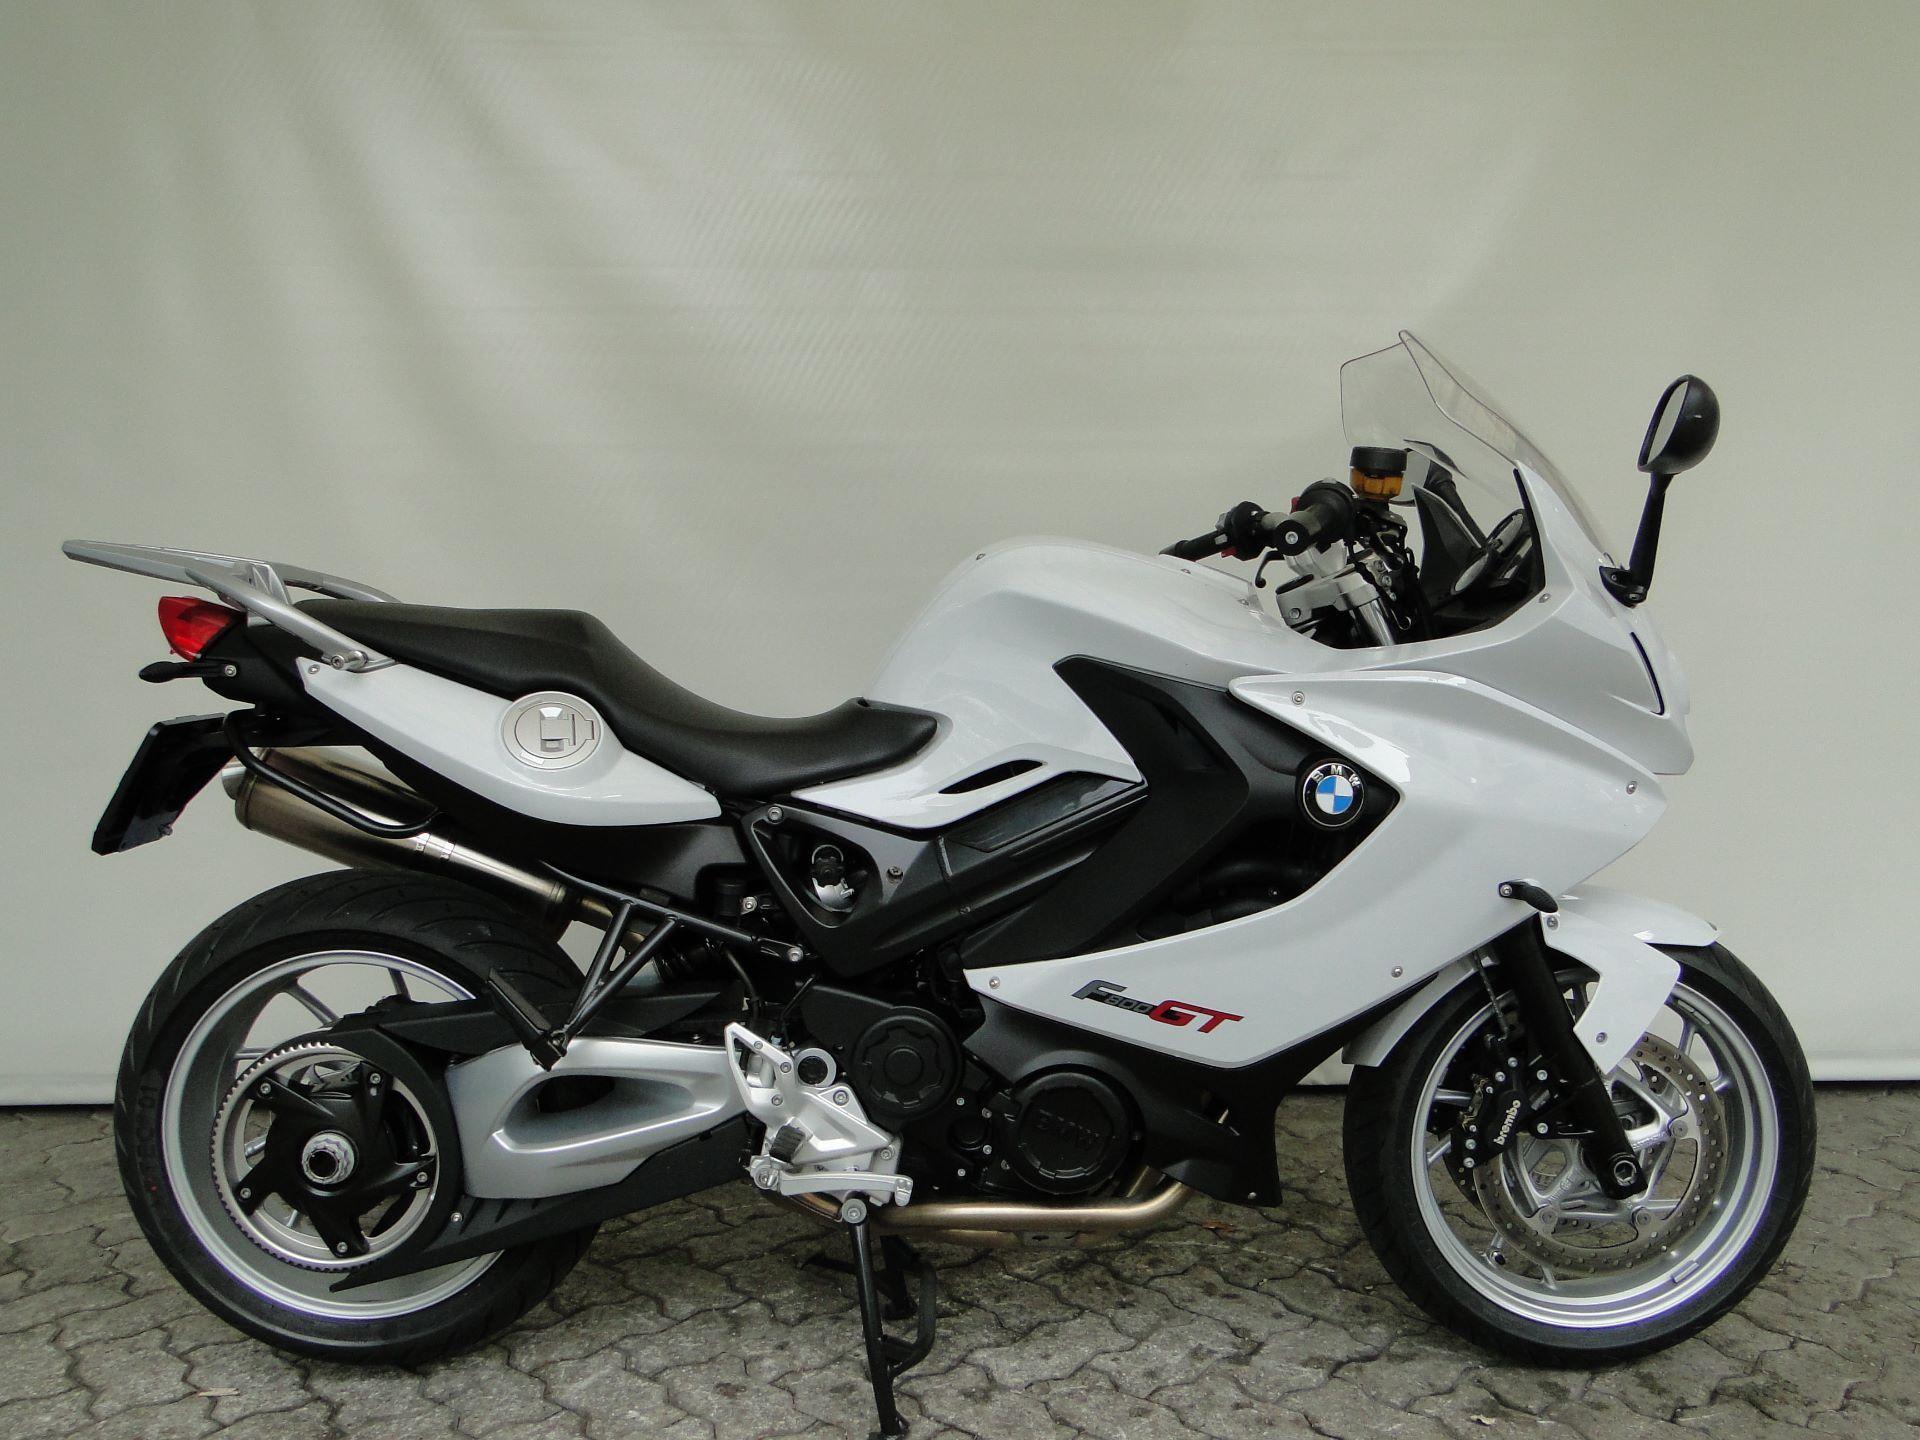 moto occasions acheter bmw f 800 gt abs hobi moto ag. Black Bedroom Furniture Sets. Home Design Ideas